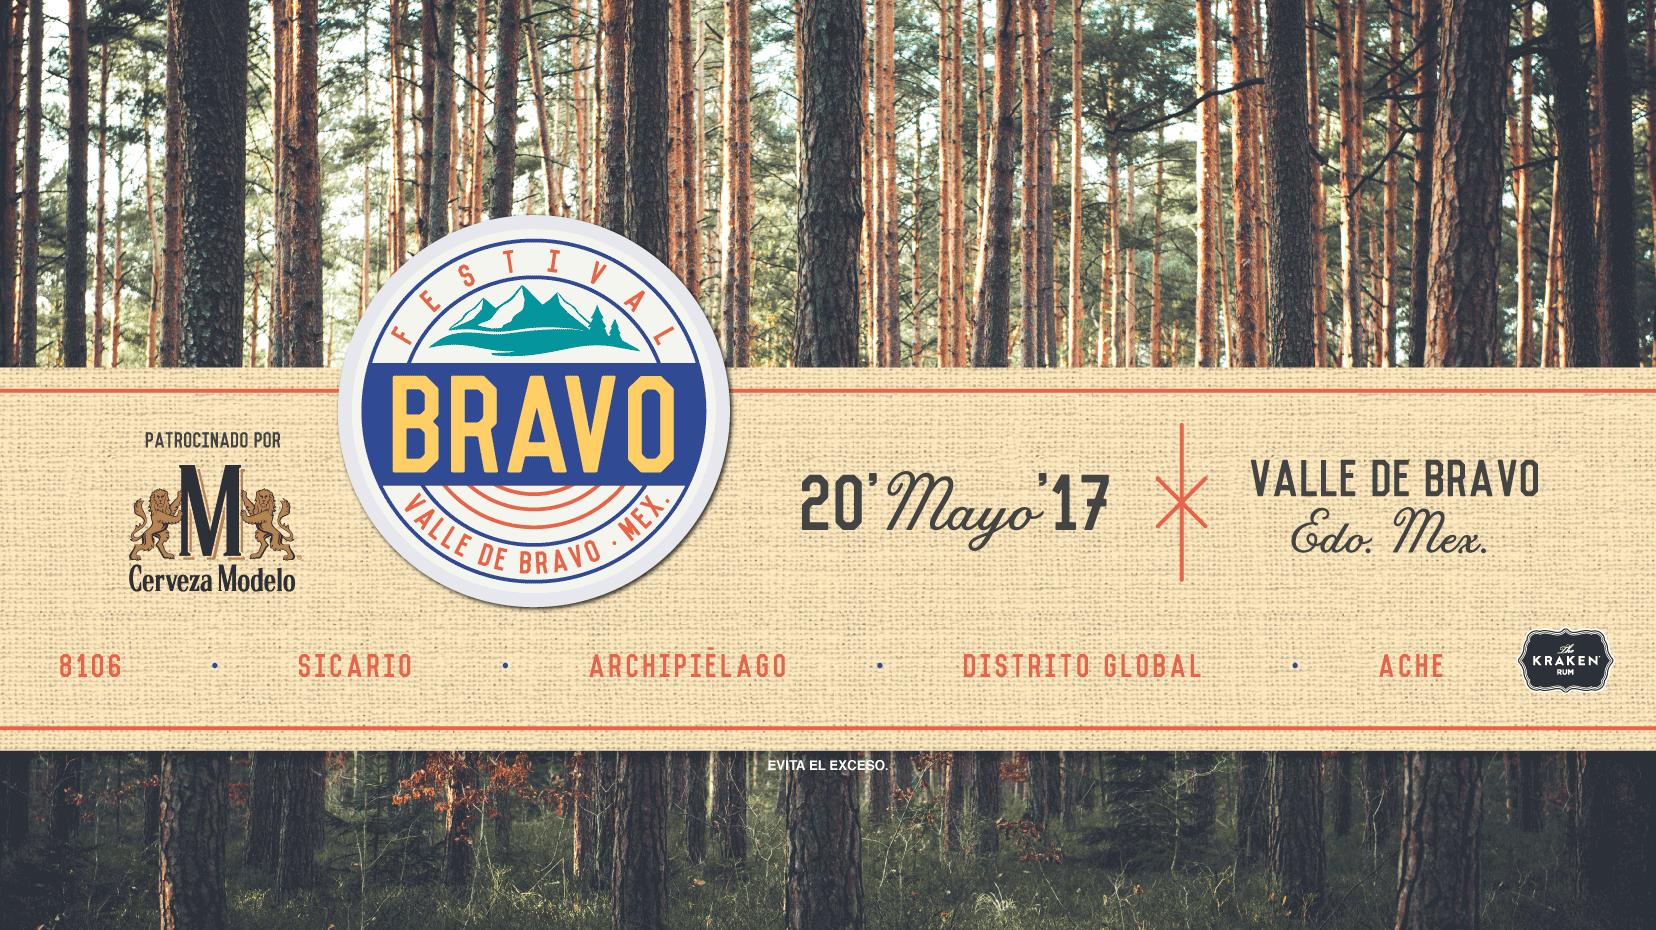 Bravo Festival